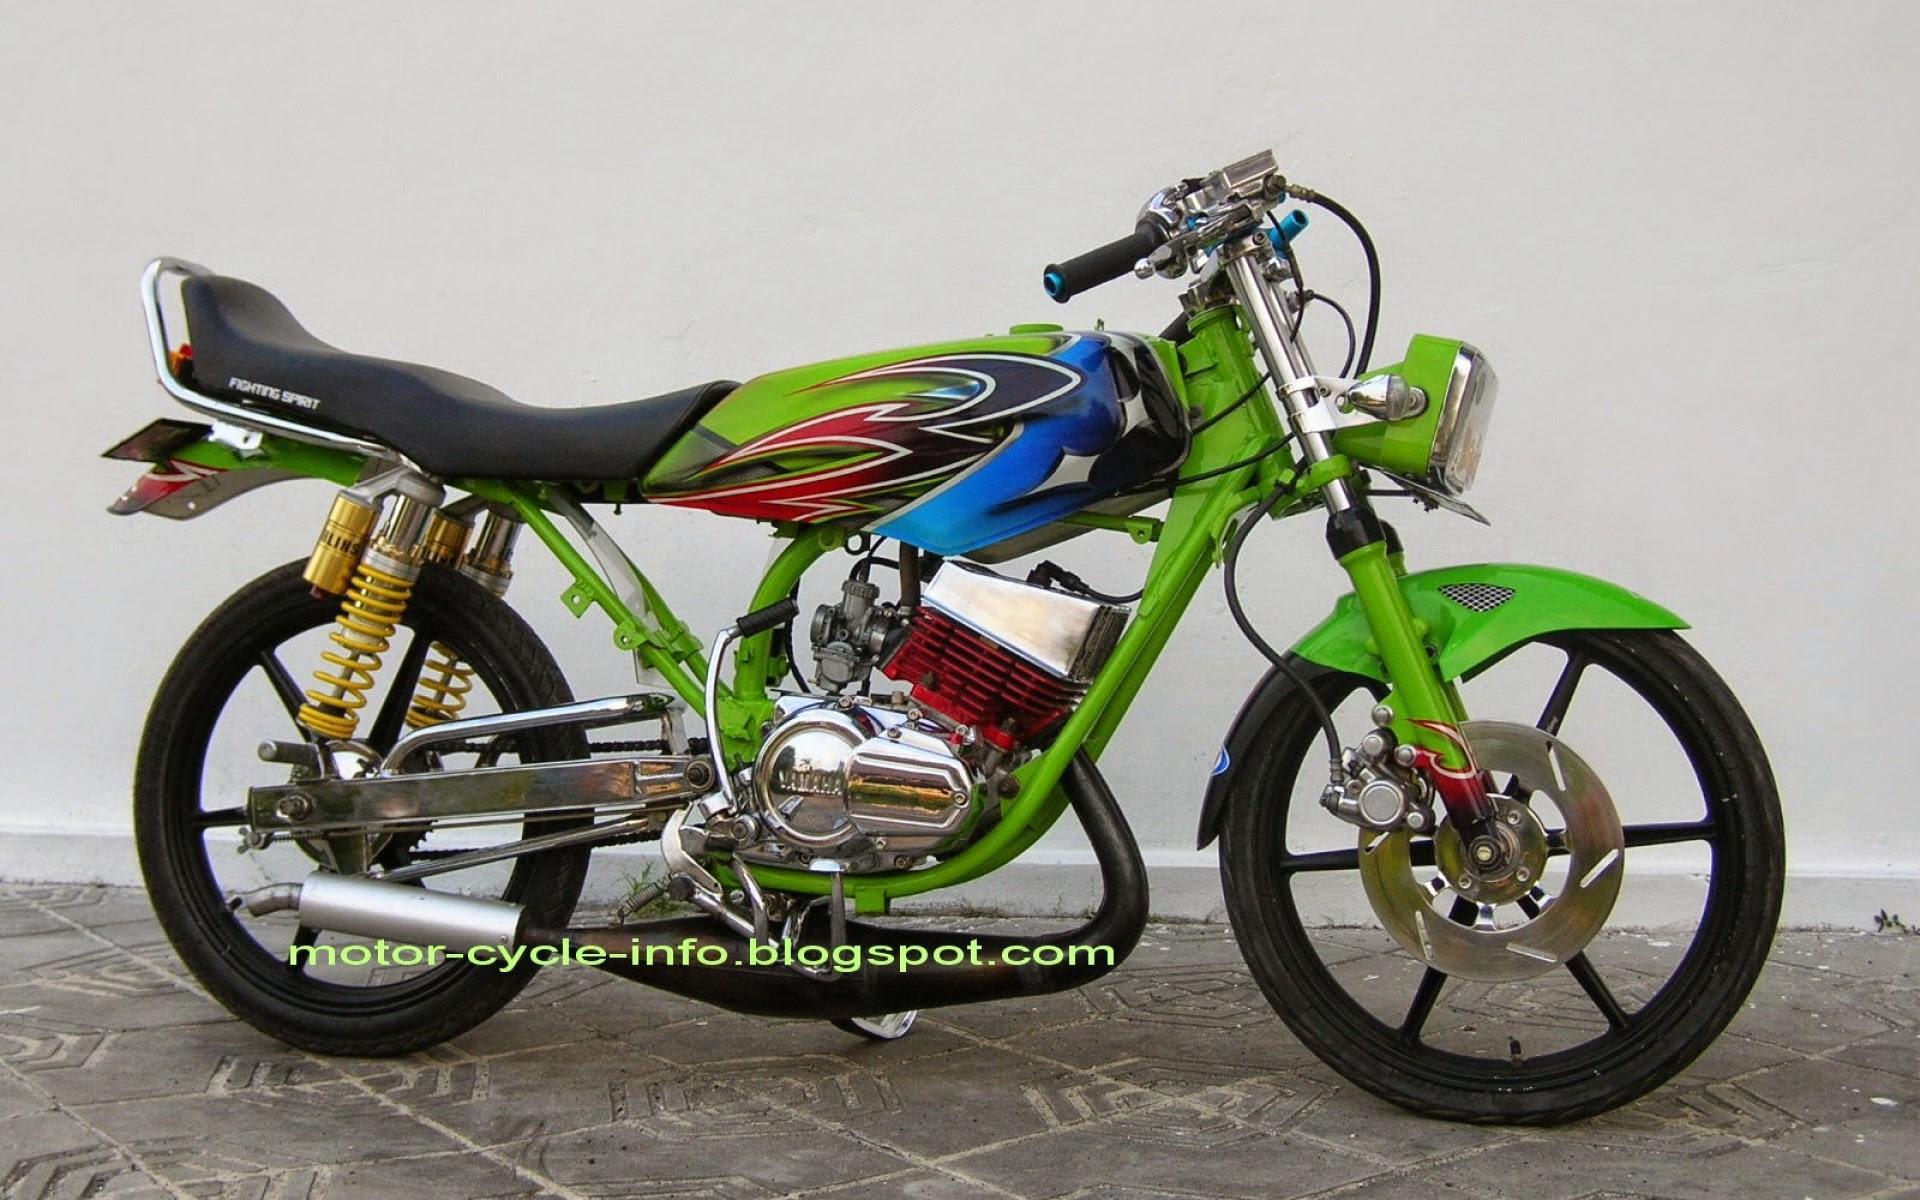 77 Gambar Modifikasi Motor Honda Karisma Terbaru Kakashi Modifikasi